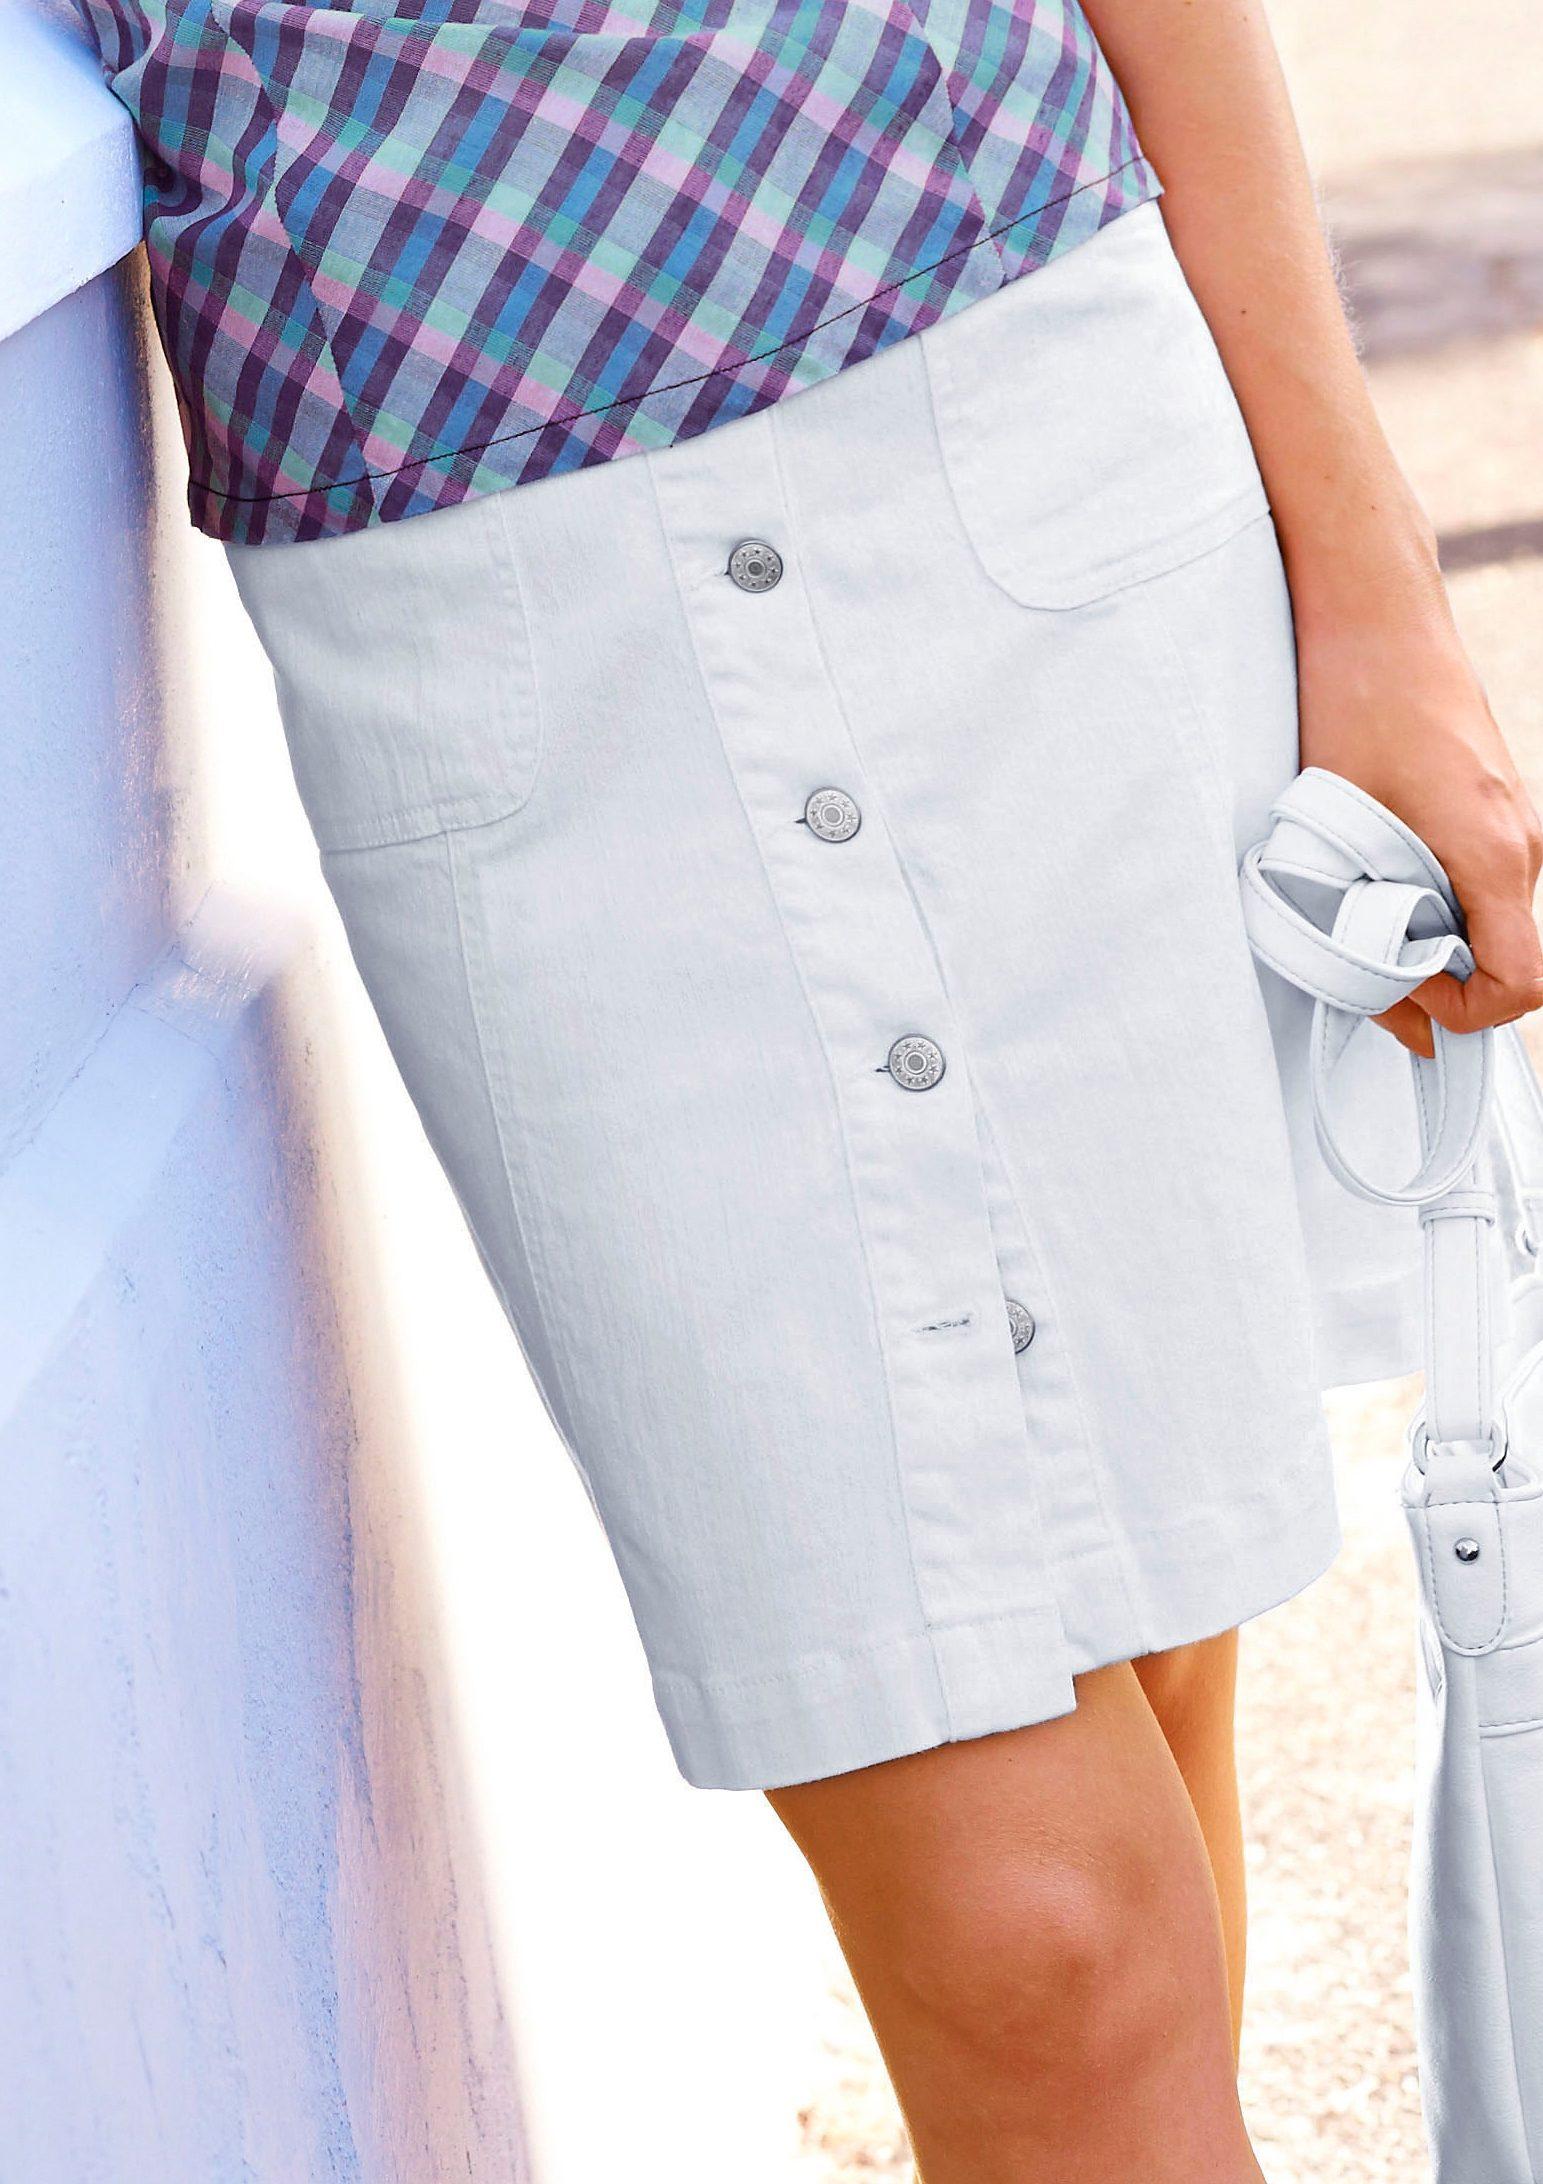 Knopfverschluss Aniston Casual Mit Jeansrock Aniston zqVGUSpM